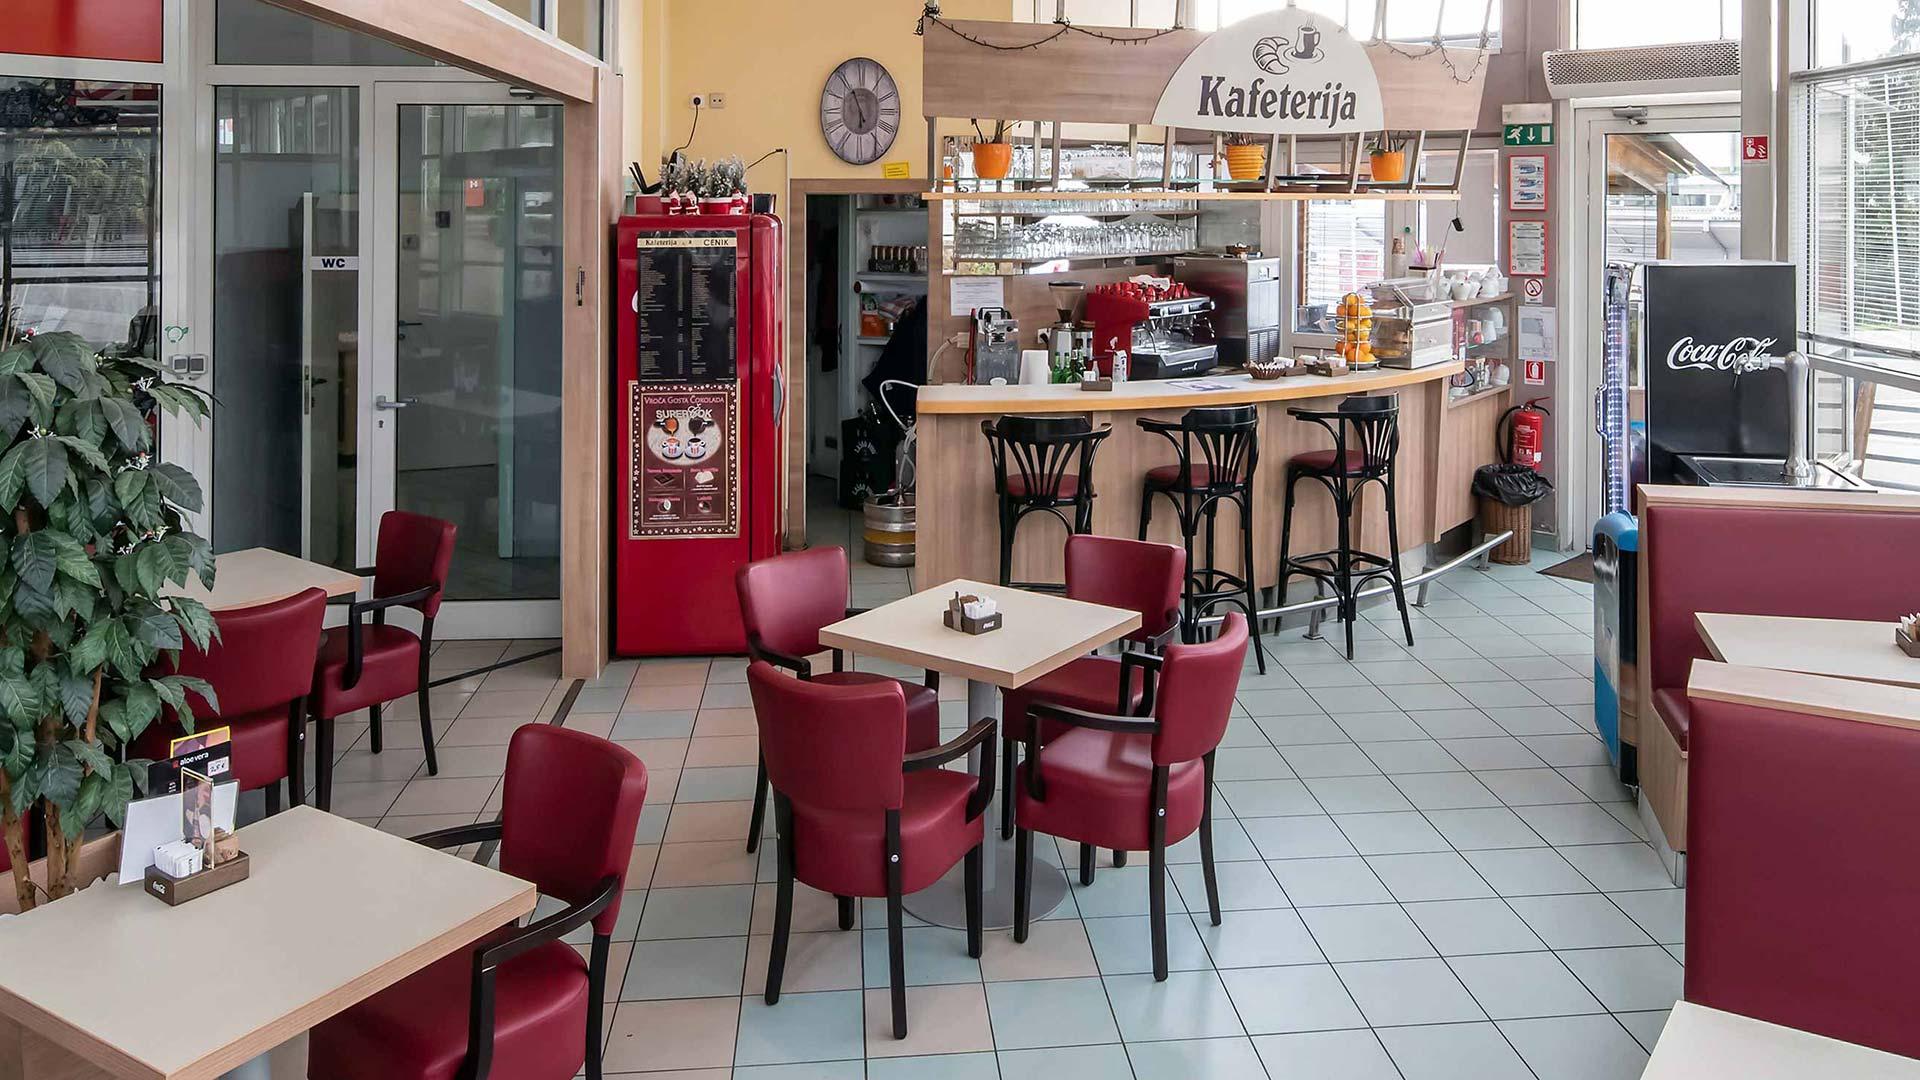 642-hero-Kafeterija